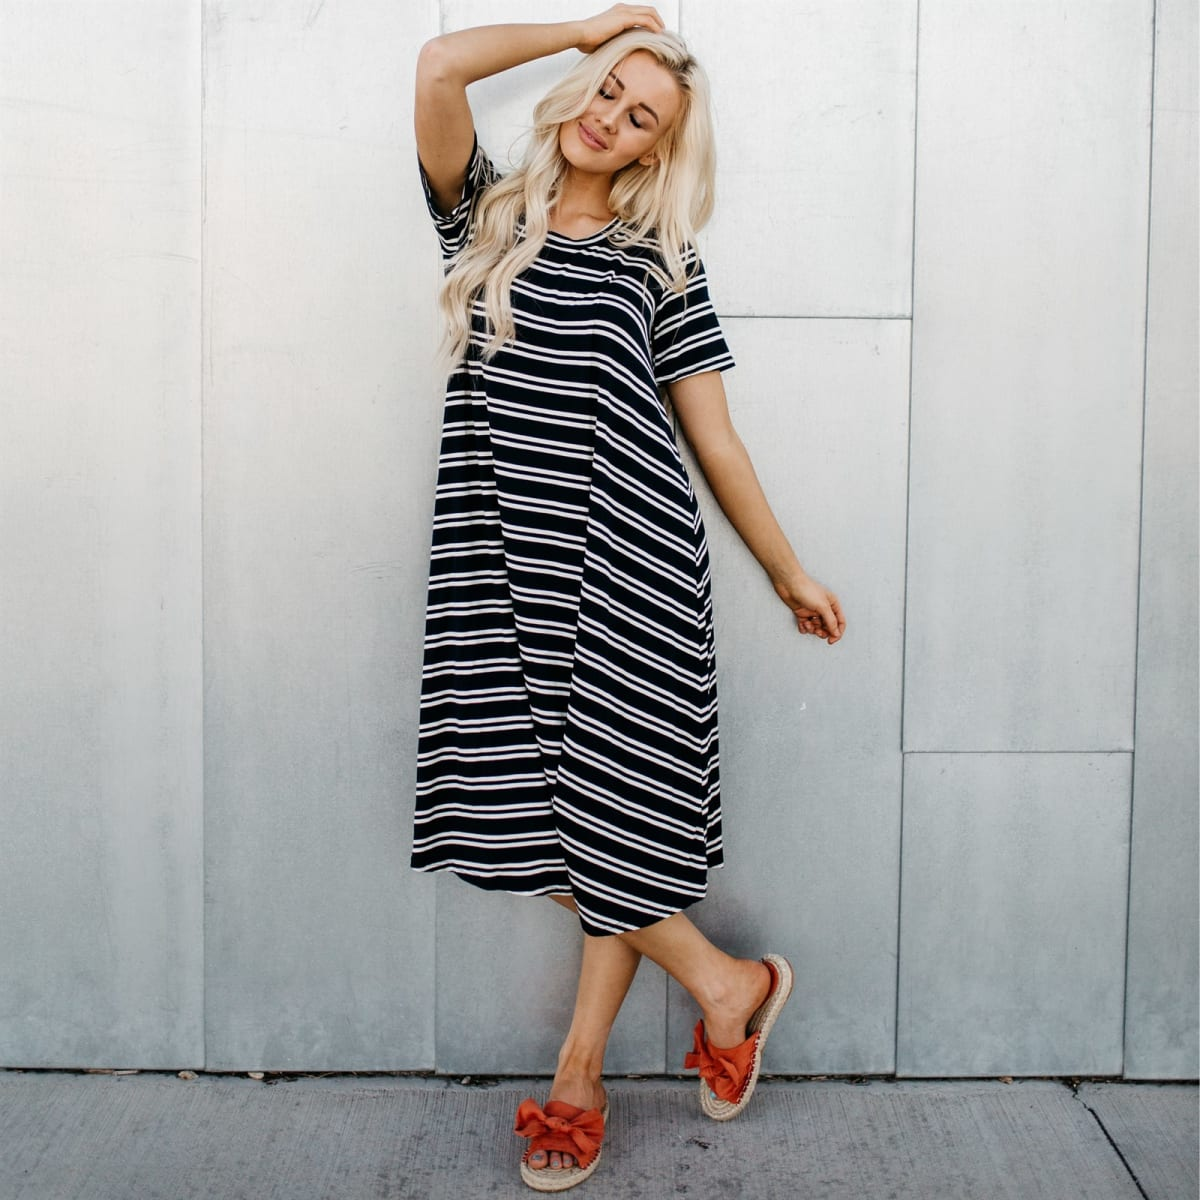 Summer dresses: woman wearing a mid length black & white swing dress.